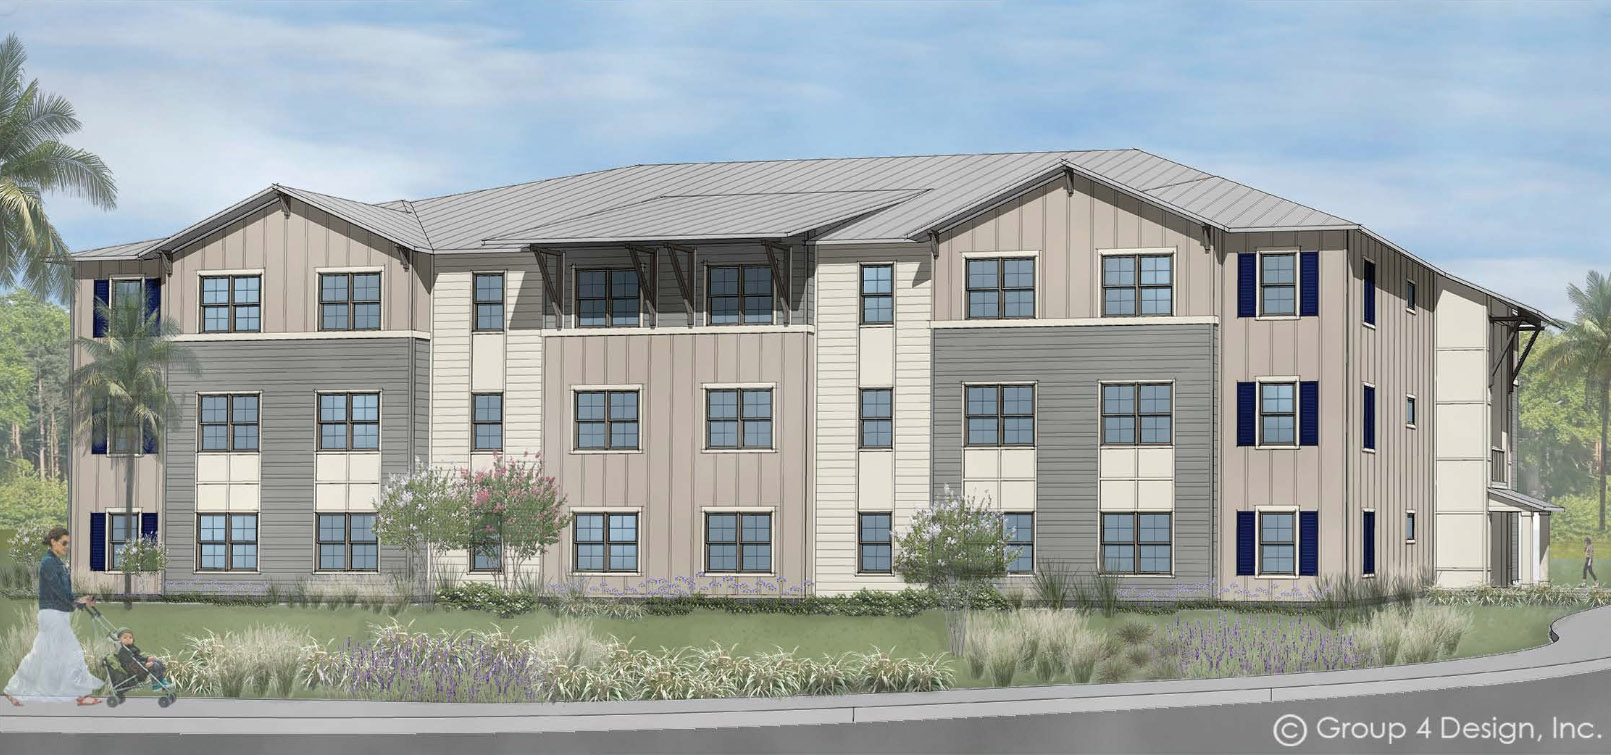 Rendering of Macie Creek Multifamily Affordable Workforce Housing by Summit Contracting Group